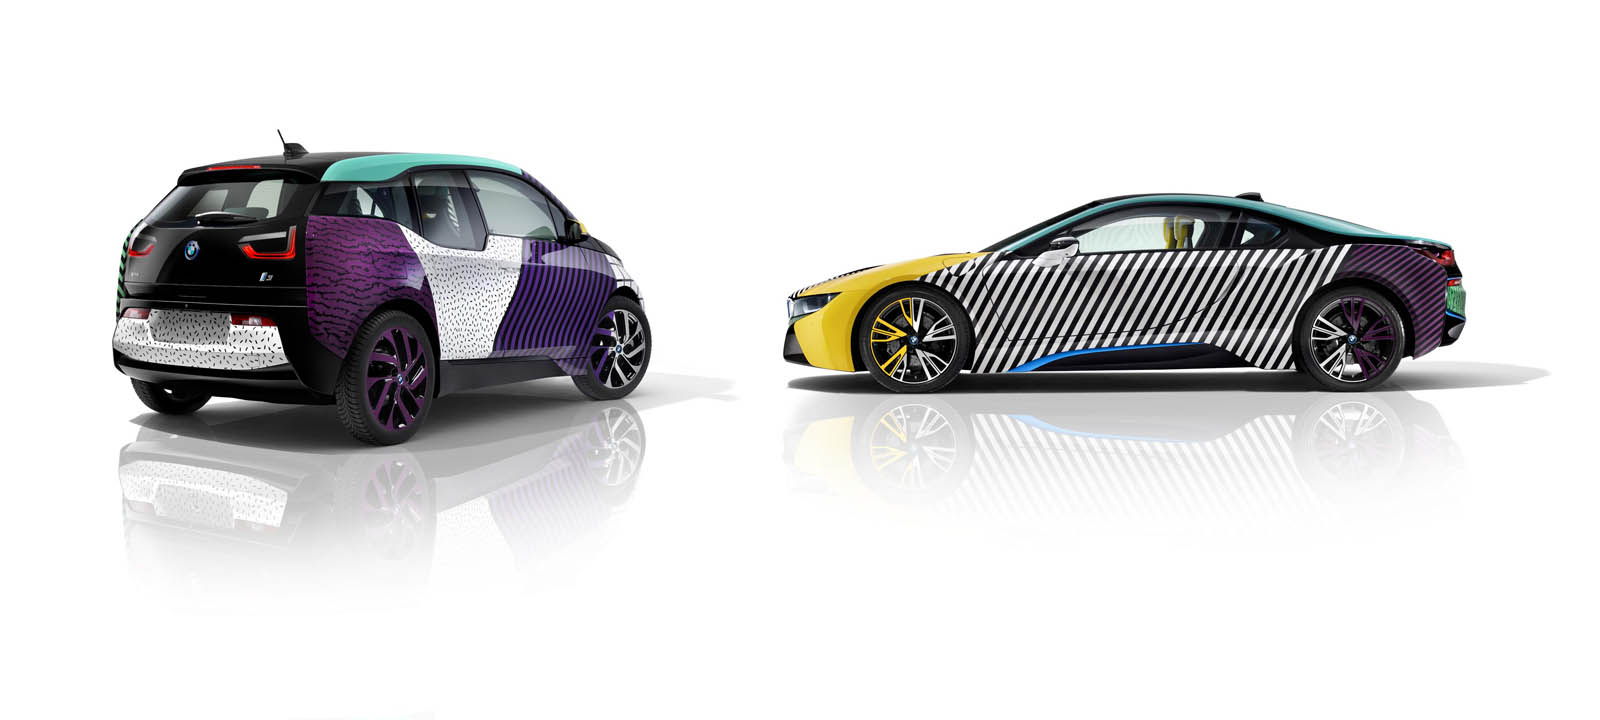 BMW i3 and i8 by Garage Italia Customs (20)